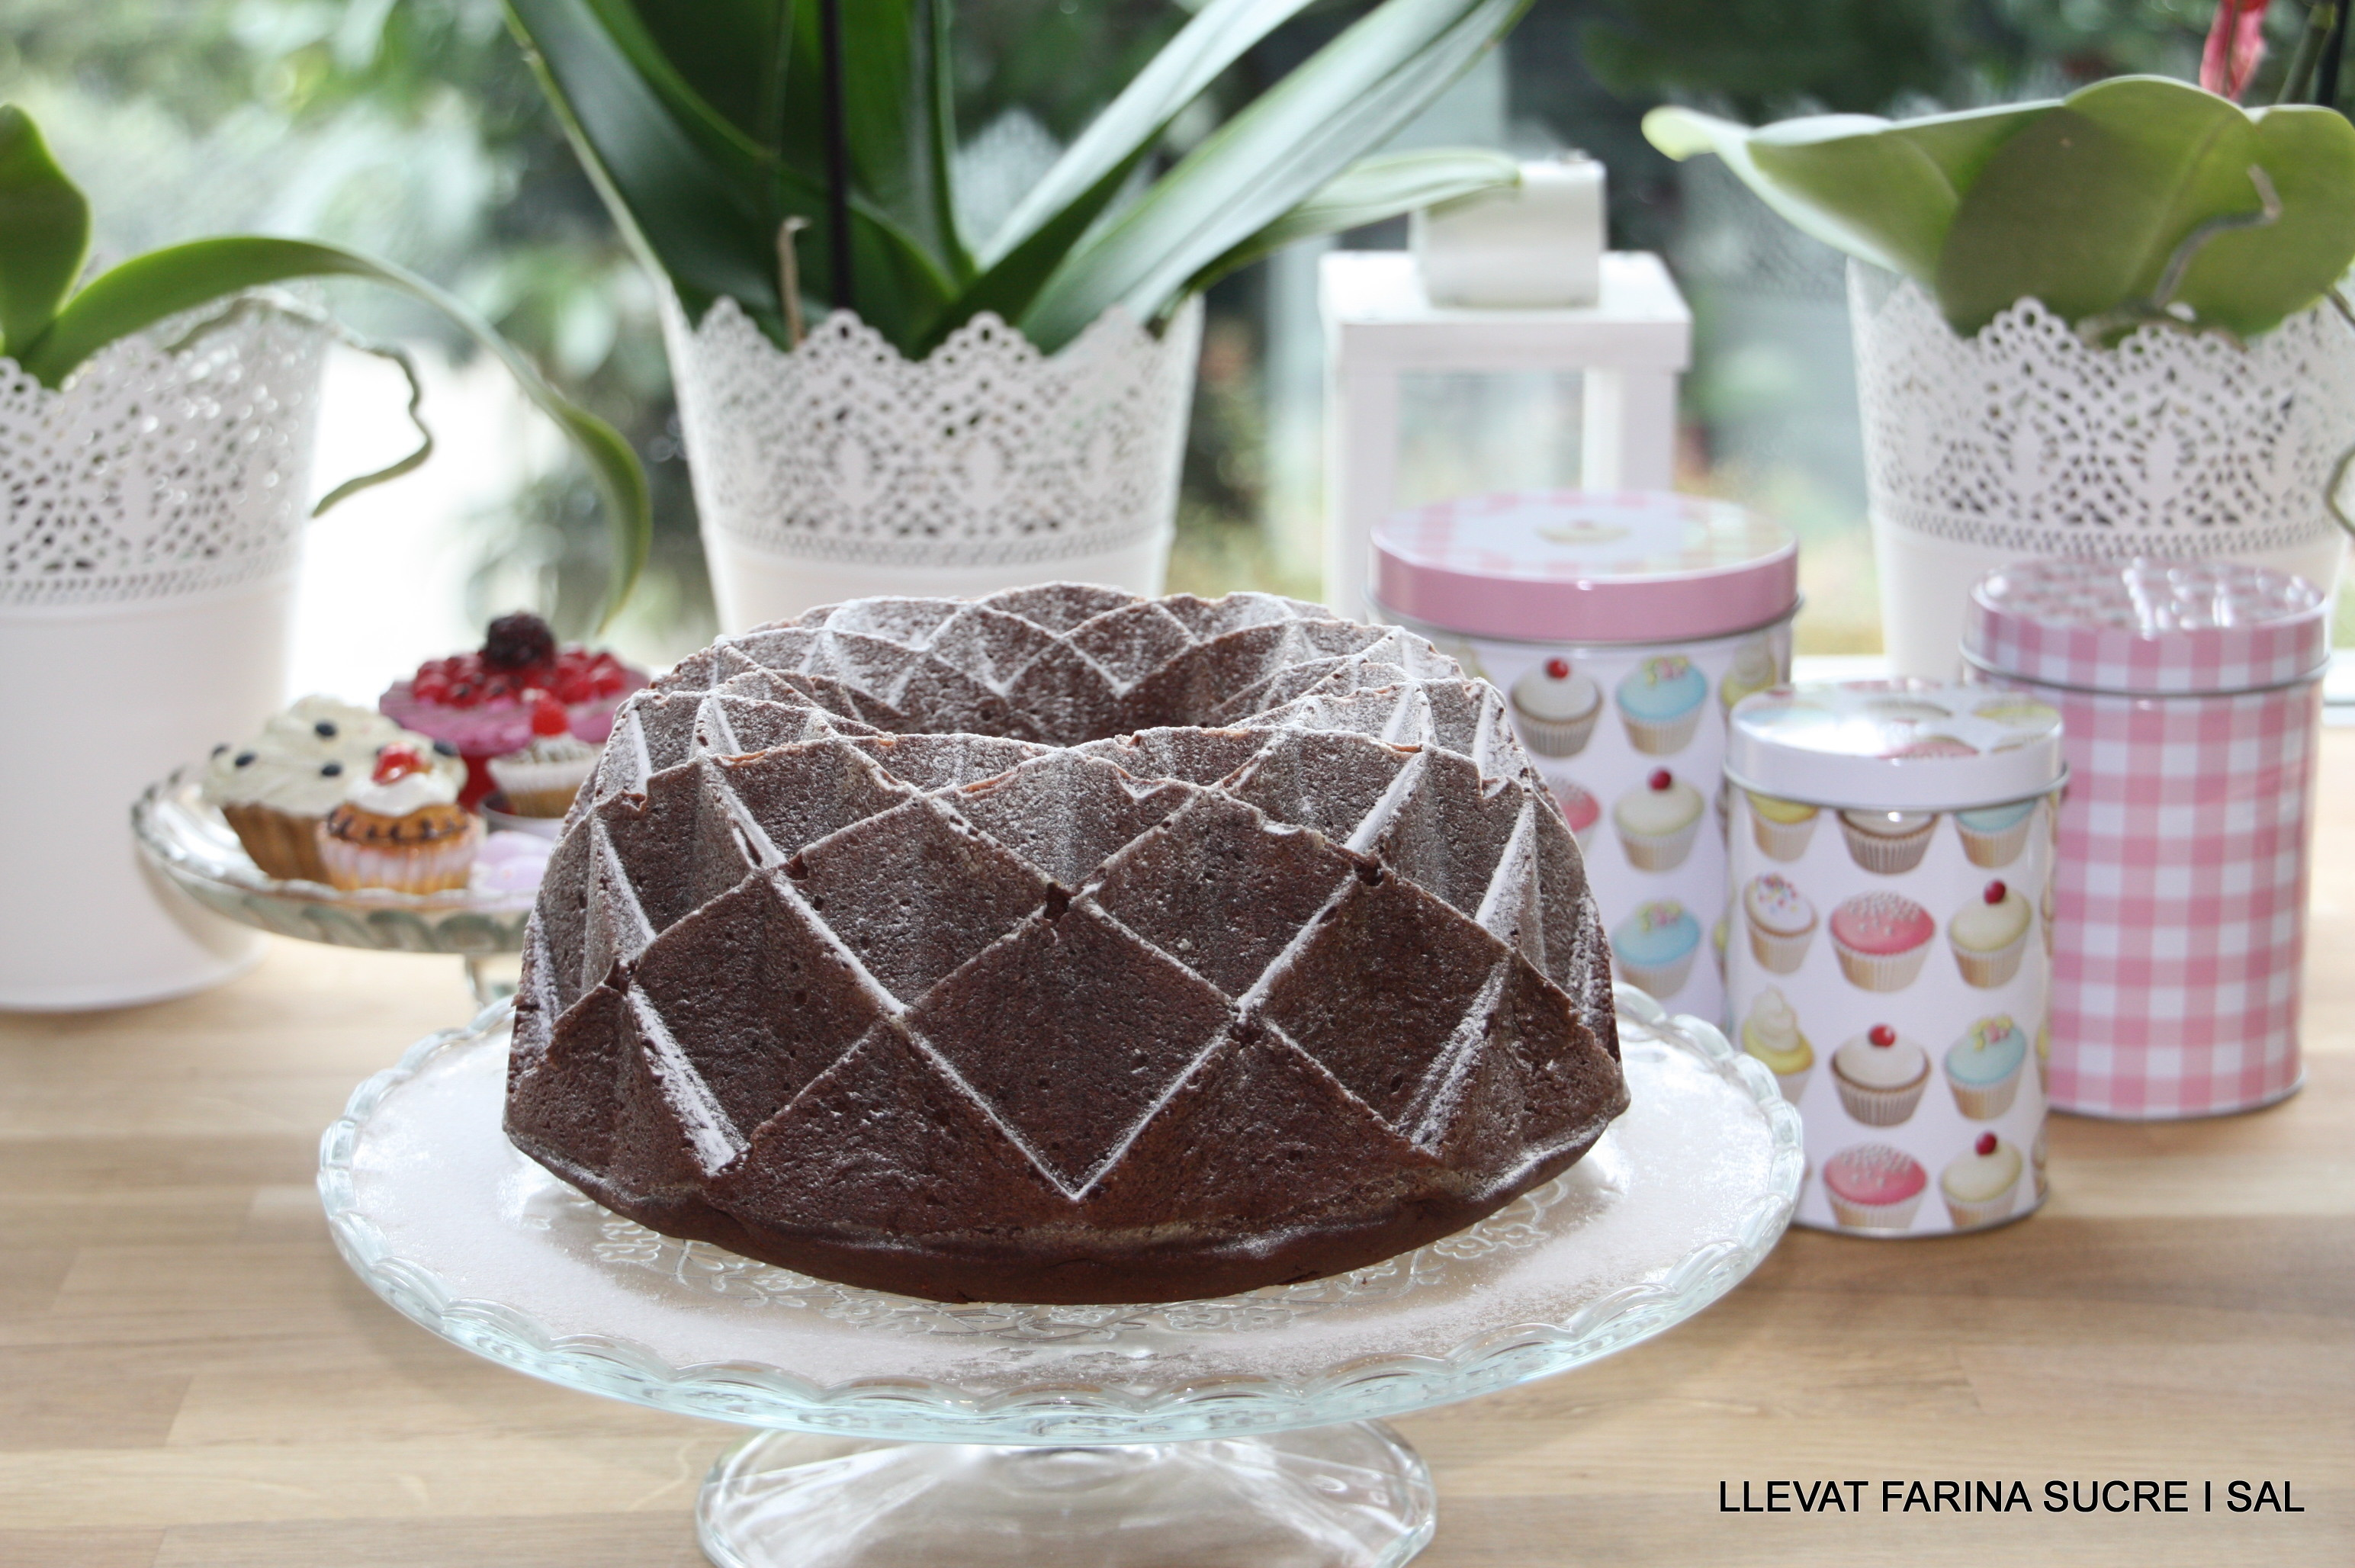 BUNDT CAKE DE XOCOLATA I CRÈMEFRAÎCHE